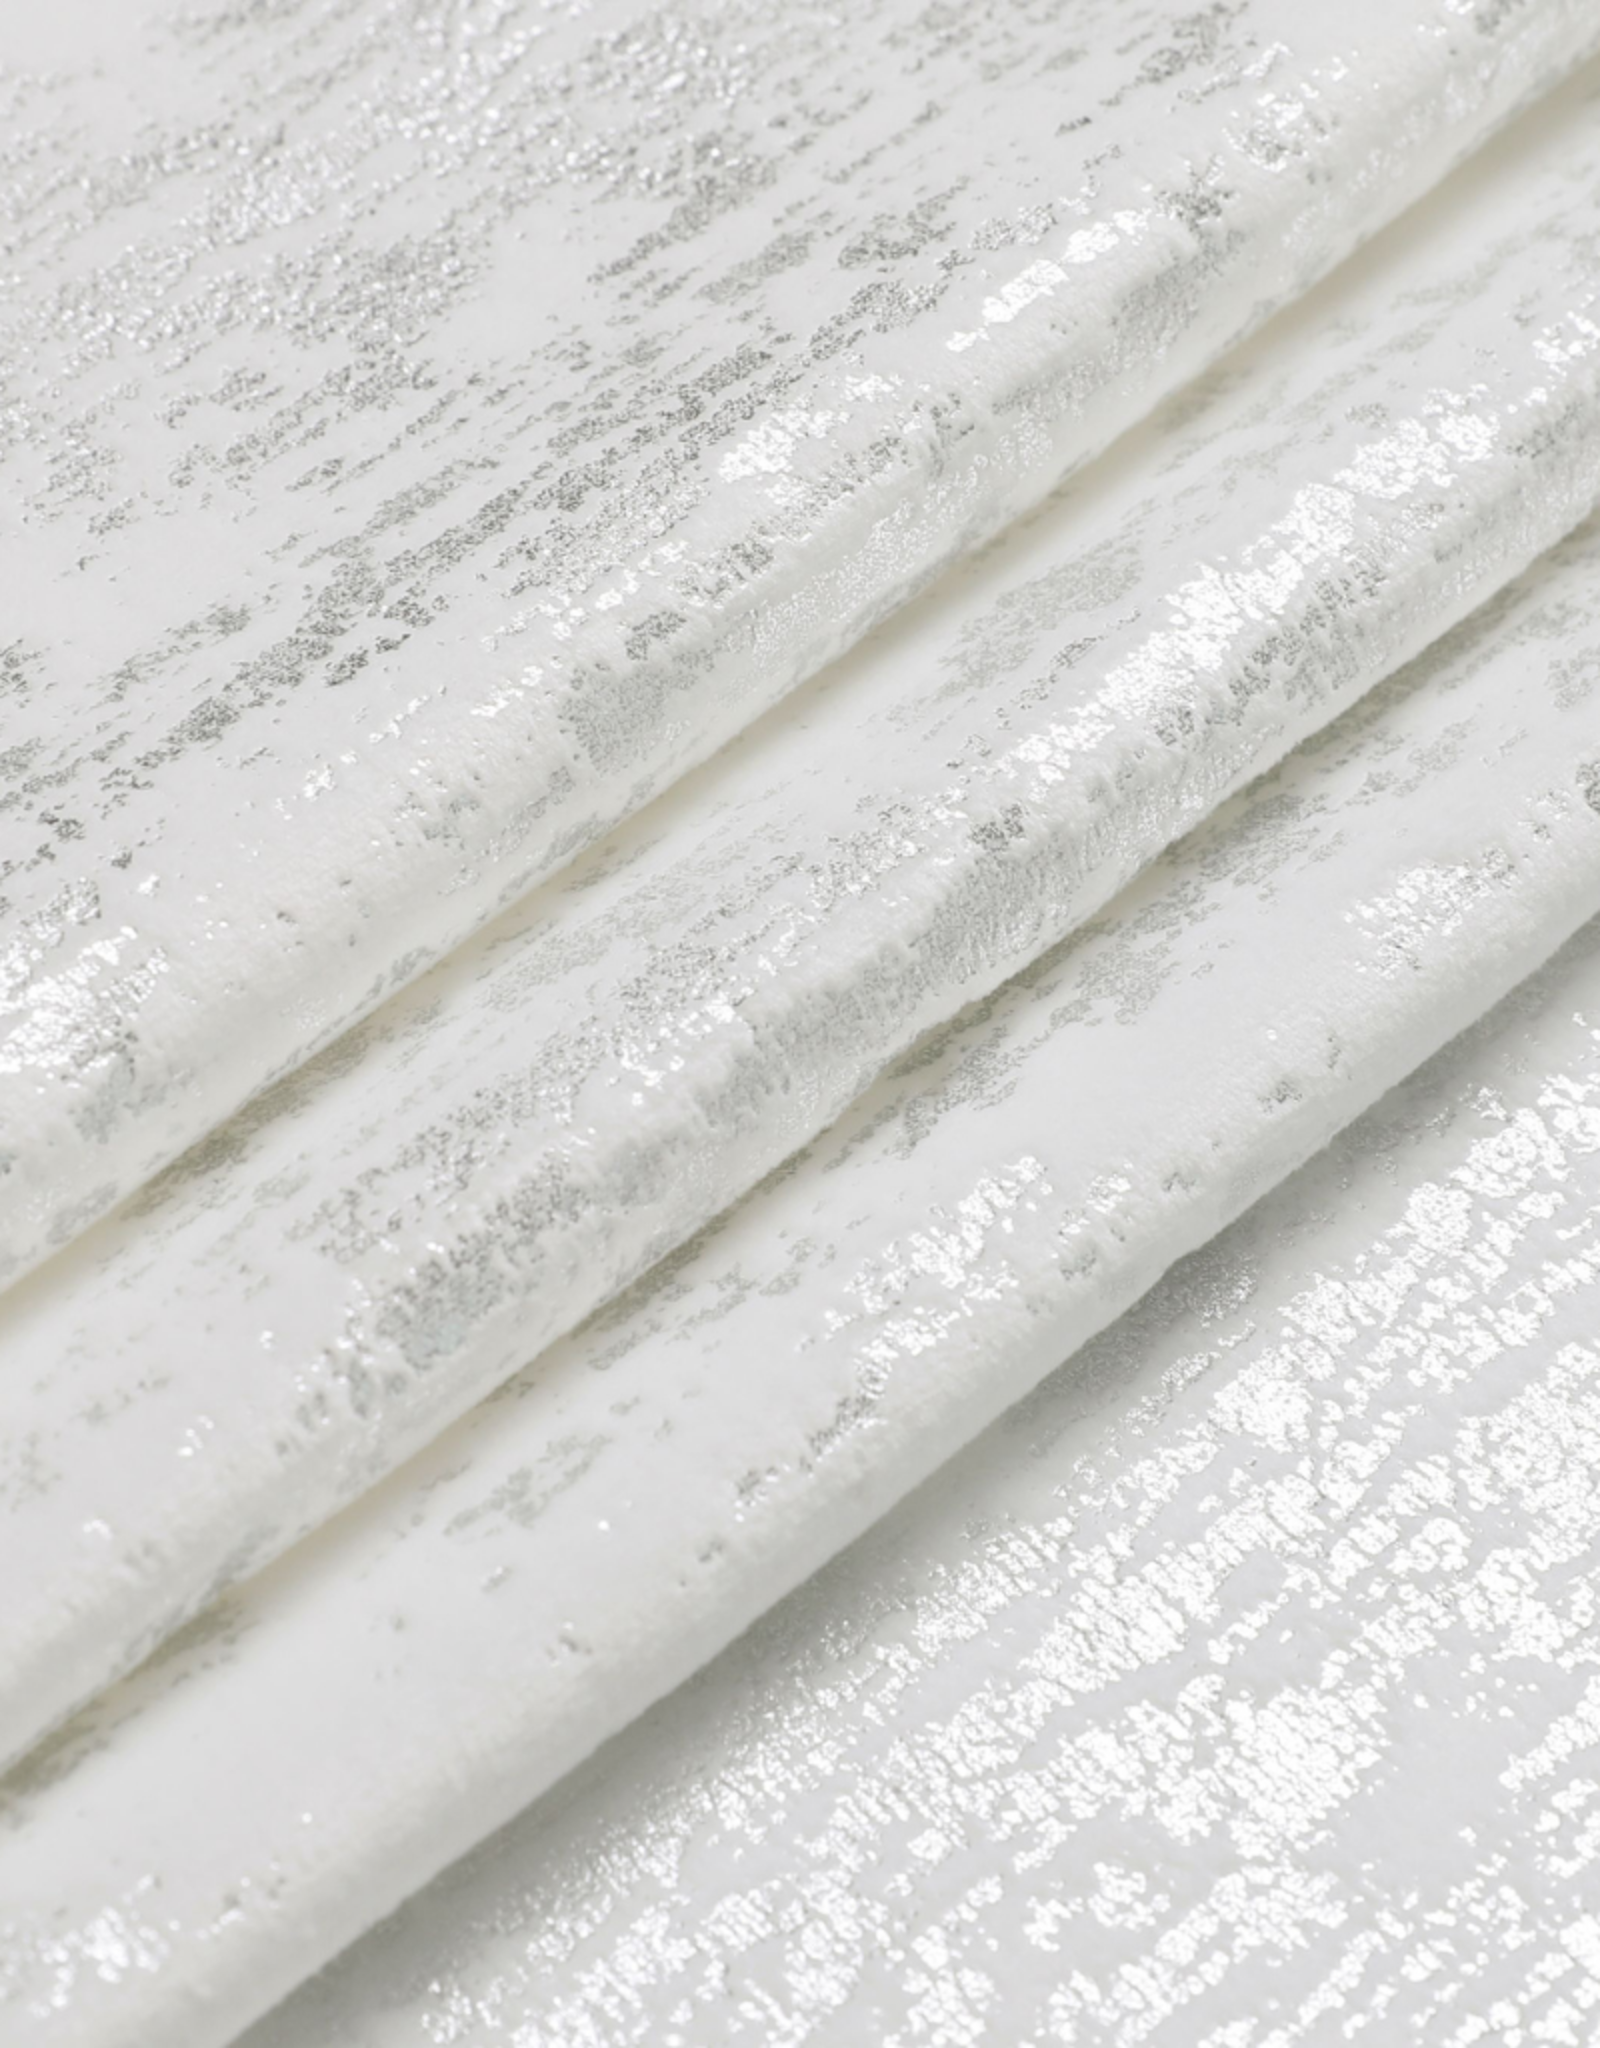 Velvet Silver & White Mosaic Tablecloth #1403